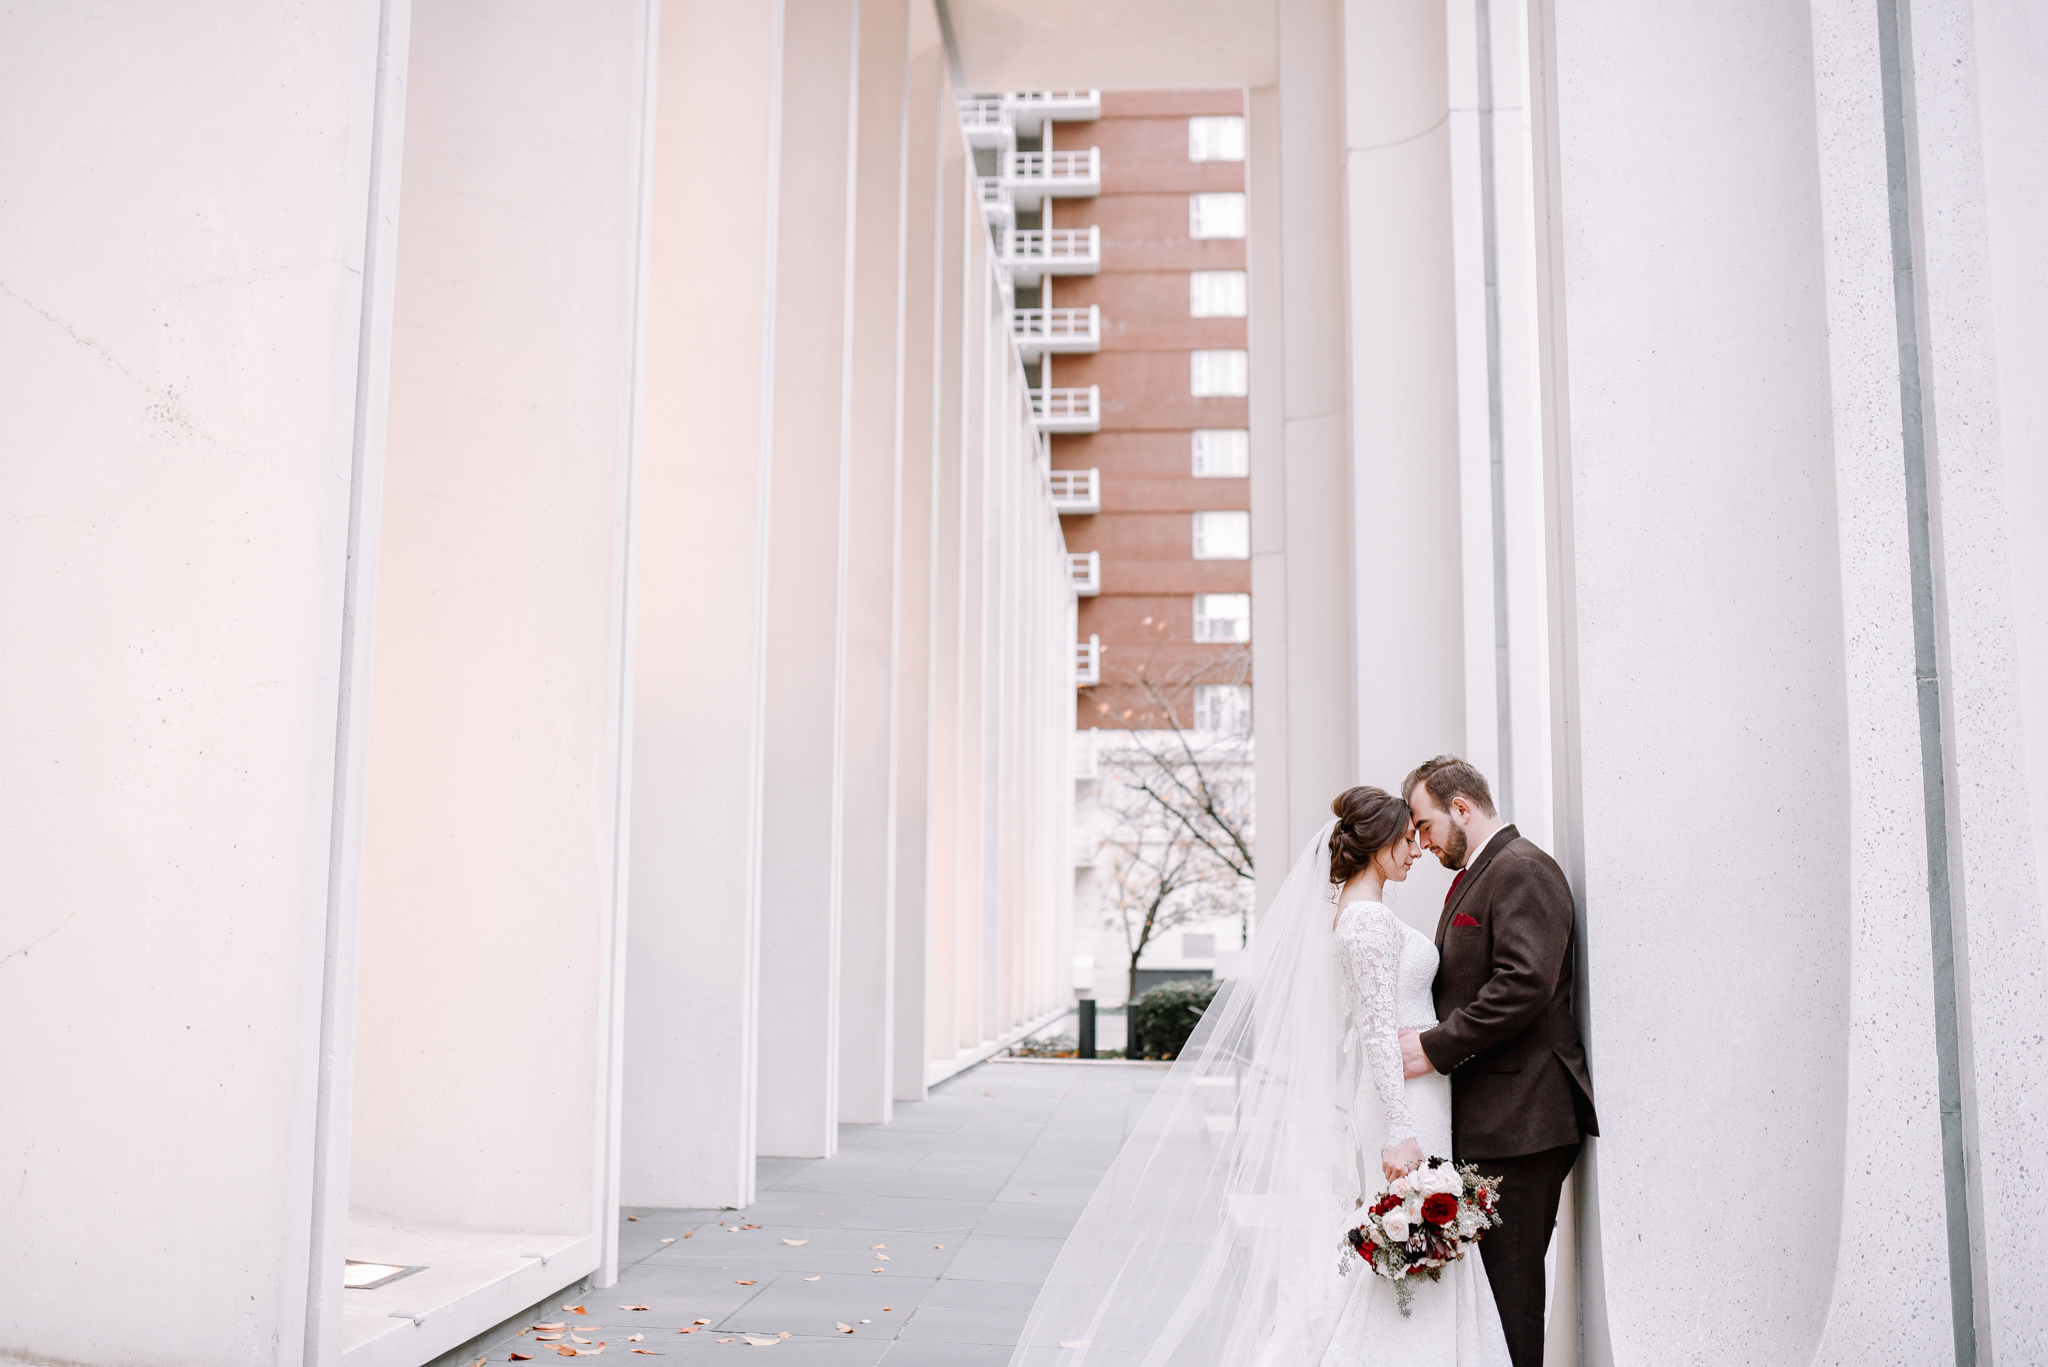 Manu and Laura - Portland Wedding Photographer - 79.jpg